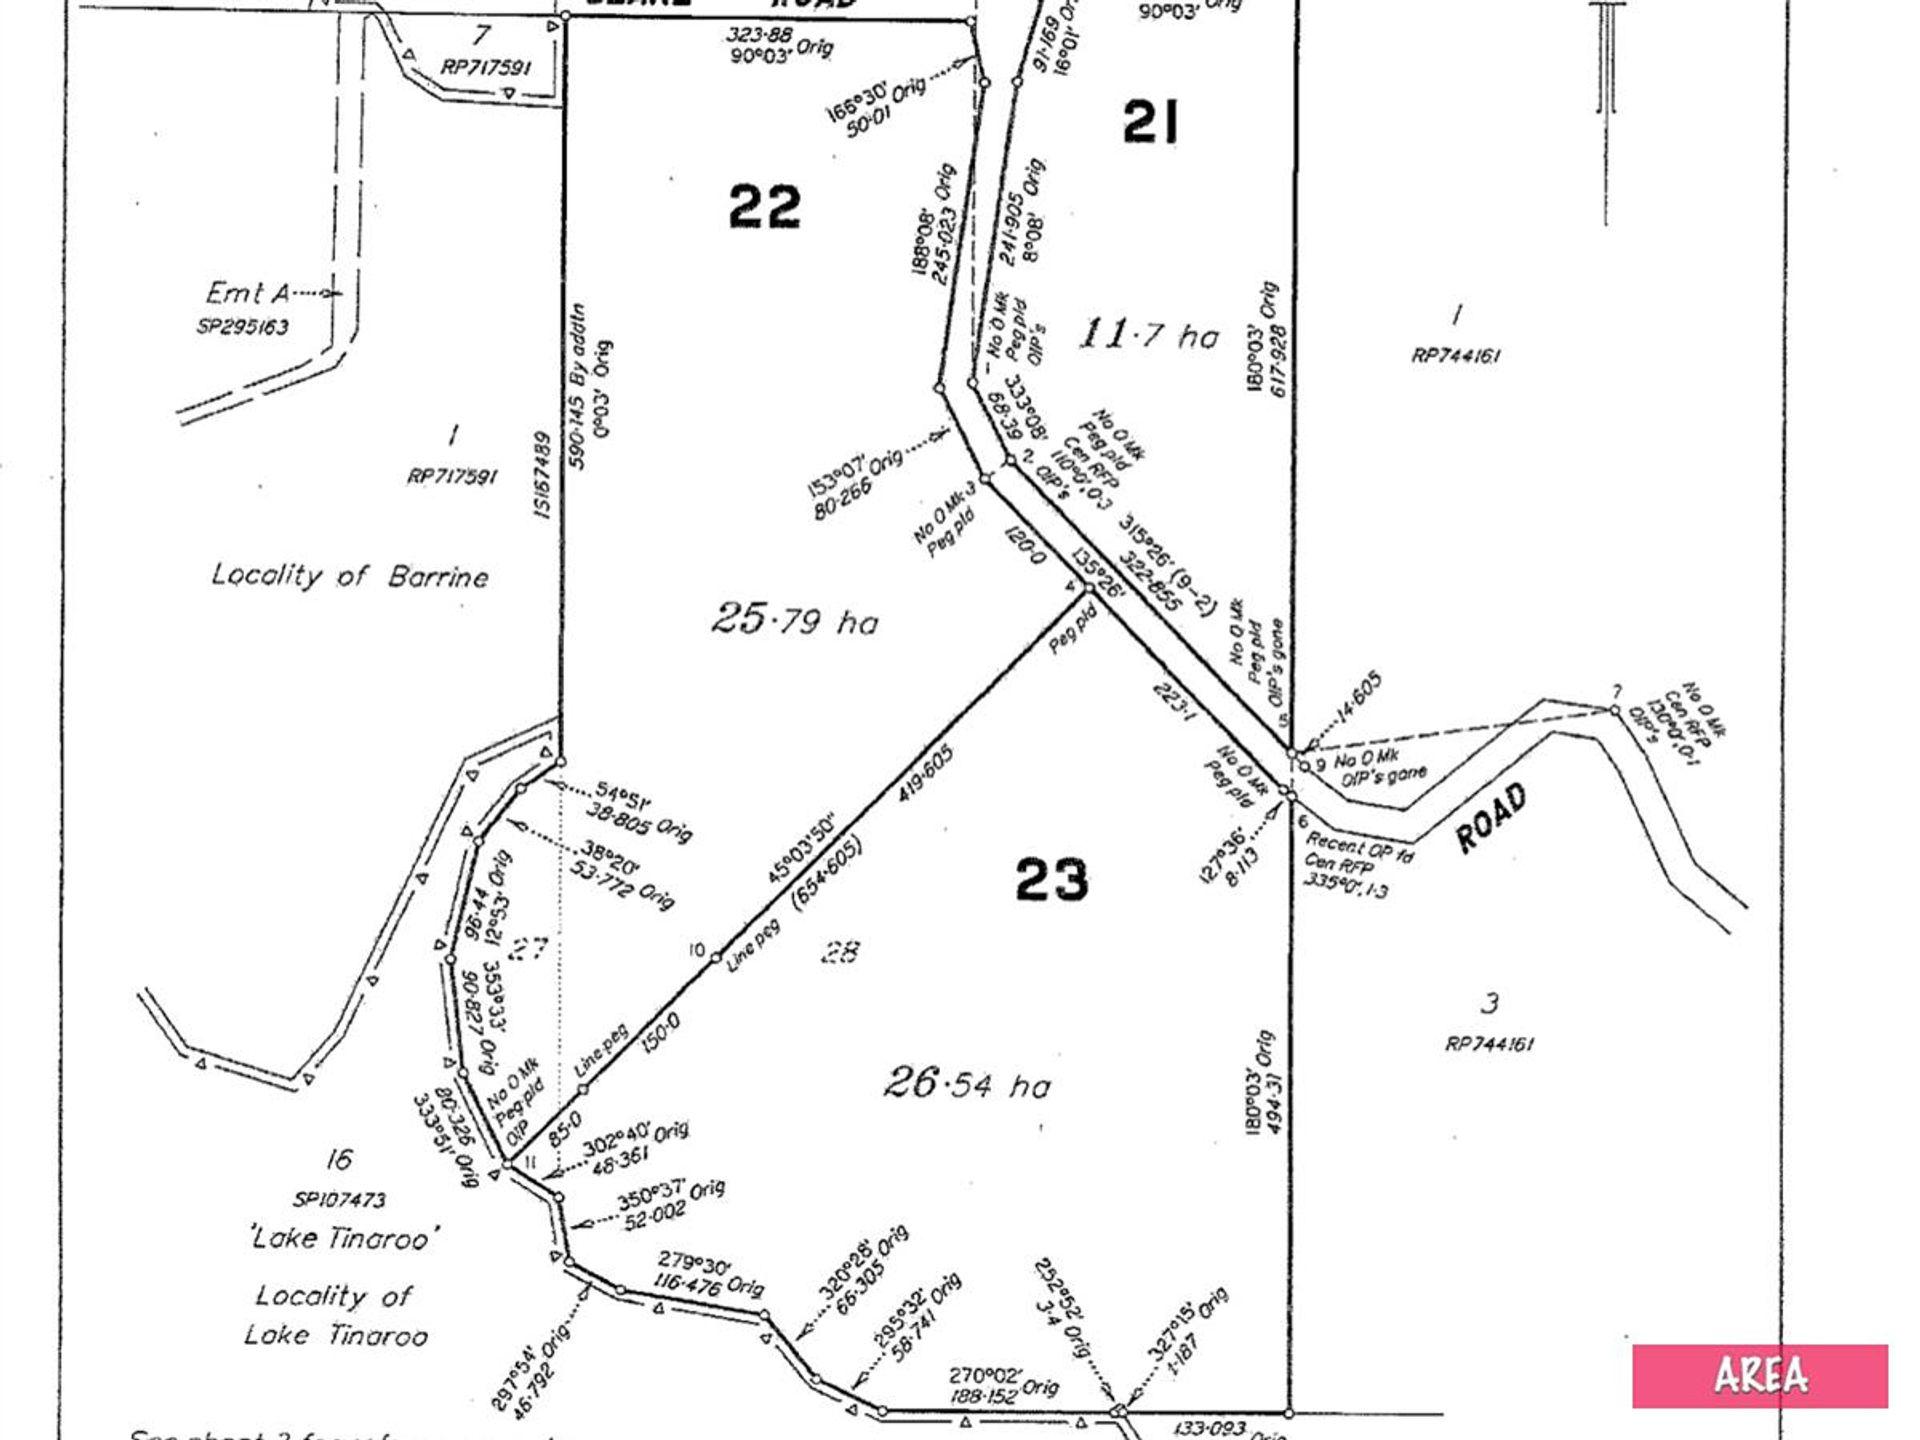 343 Powley Road, Barrine, QLD  4872